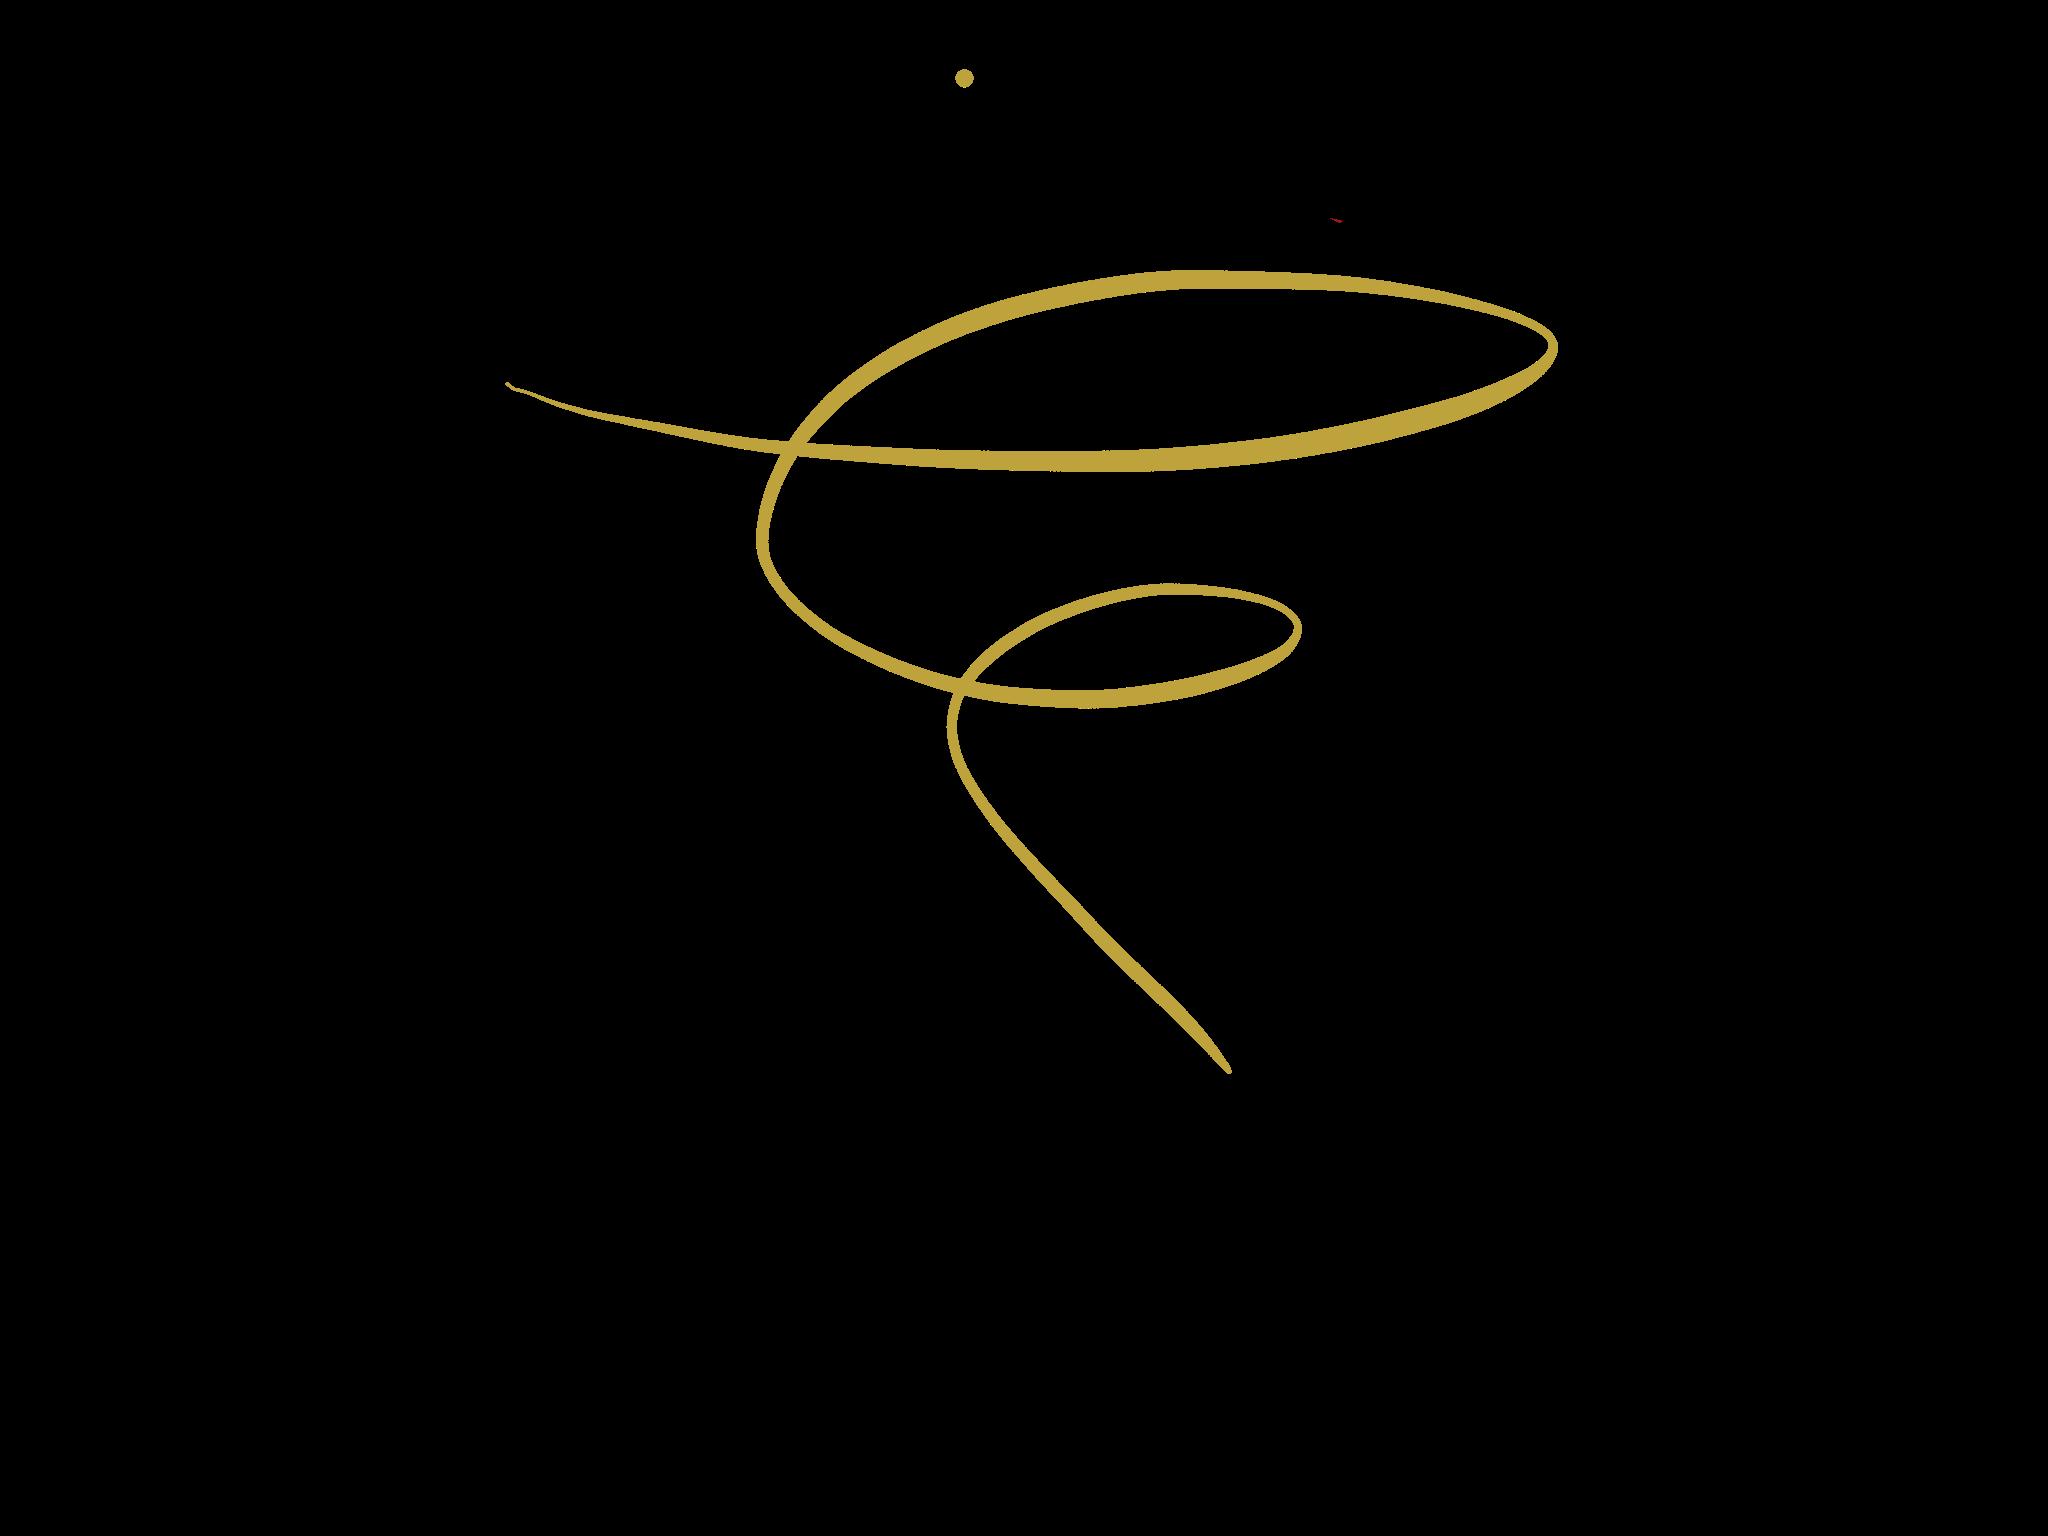 timarrita logó kcses ponttal